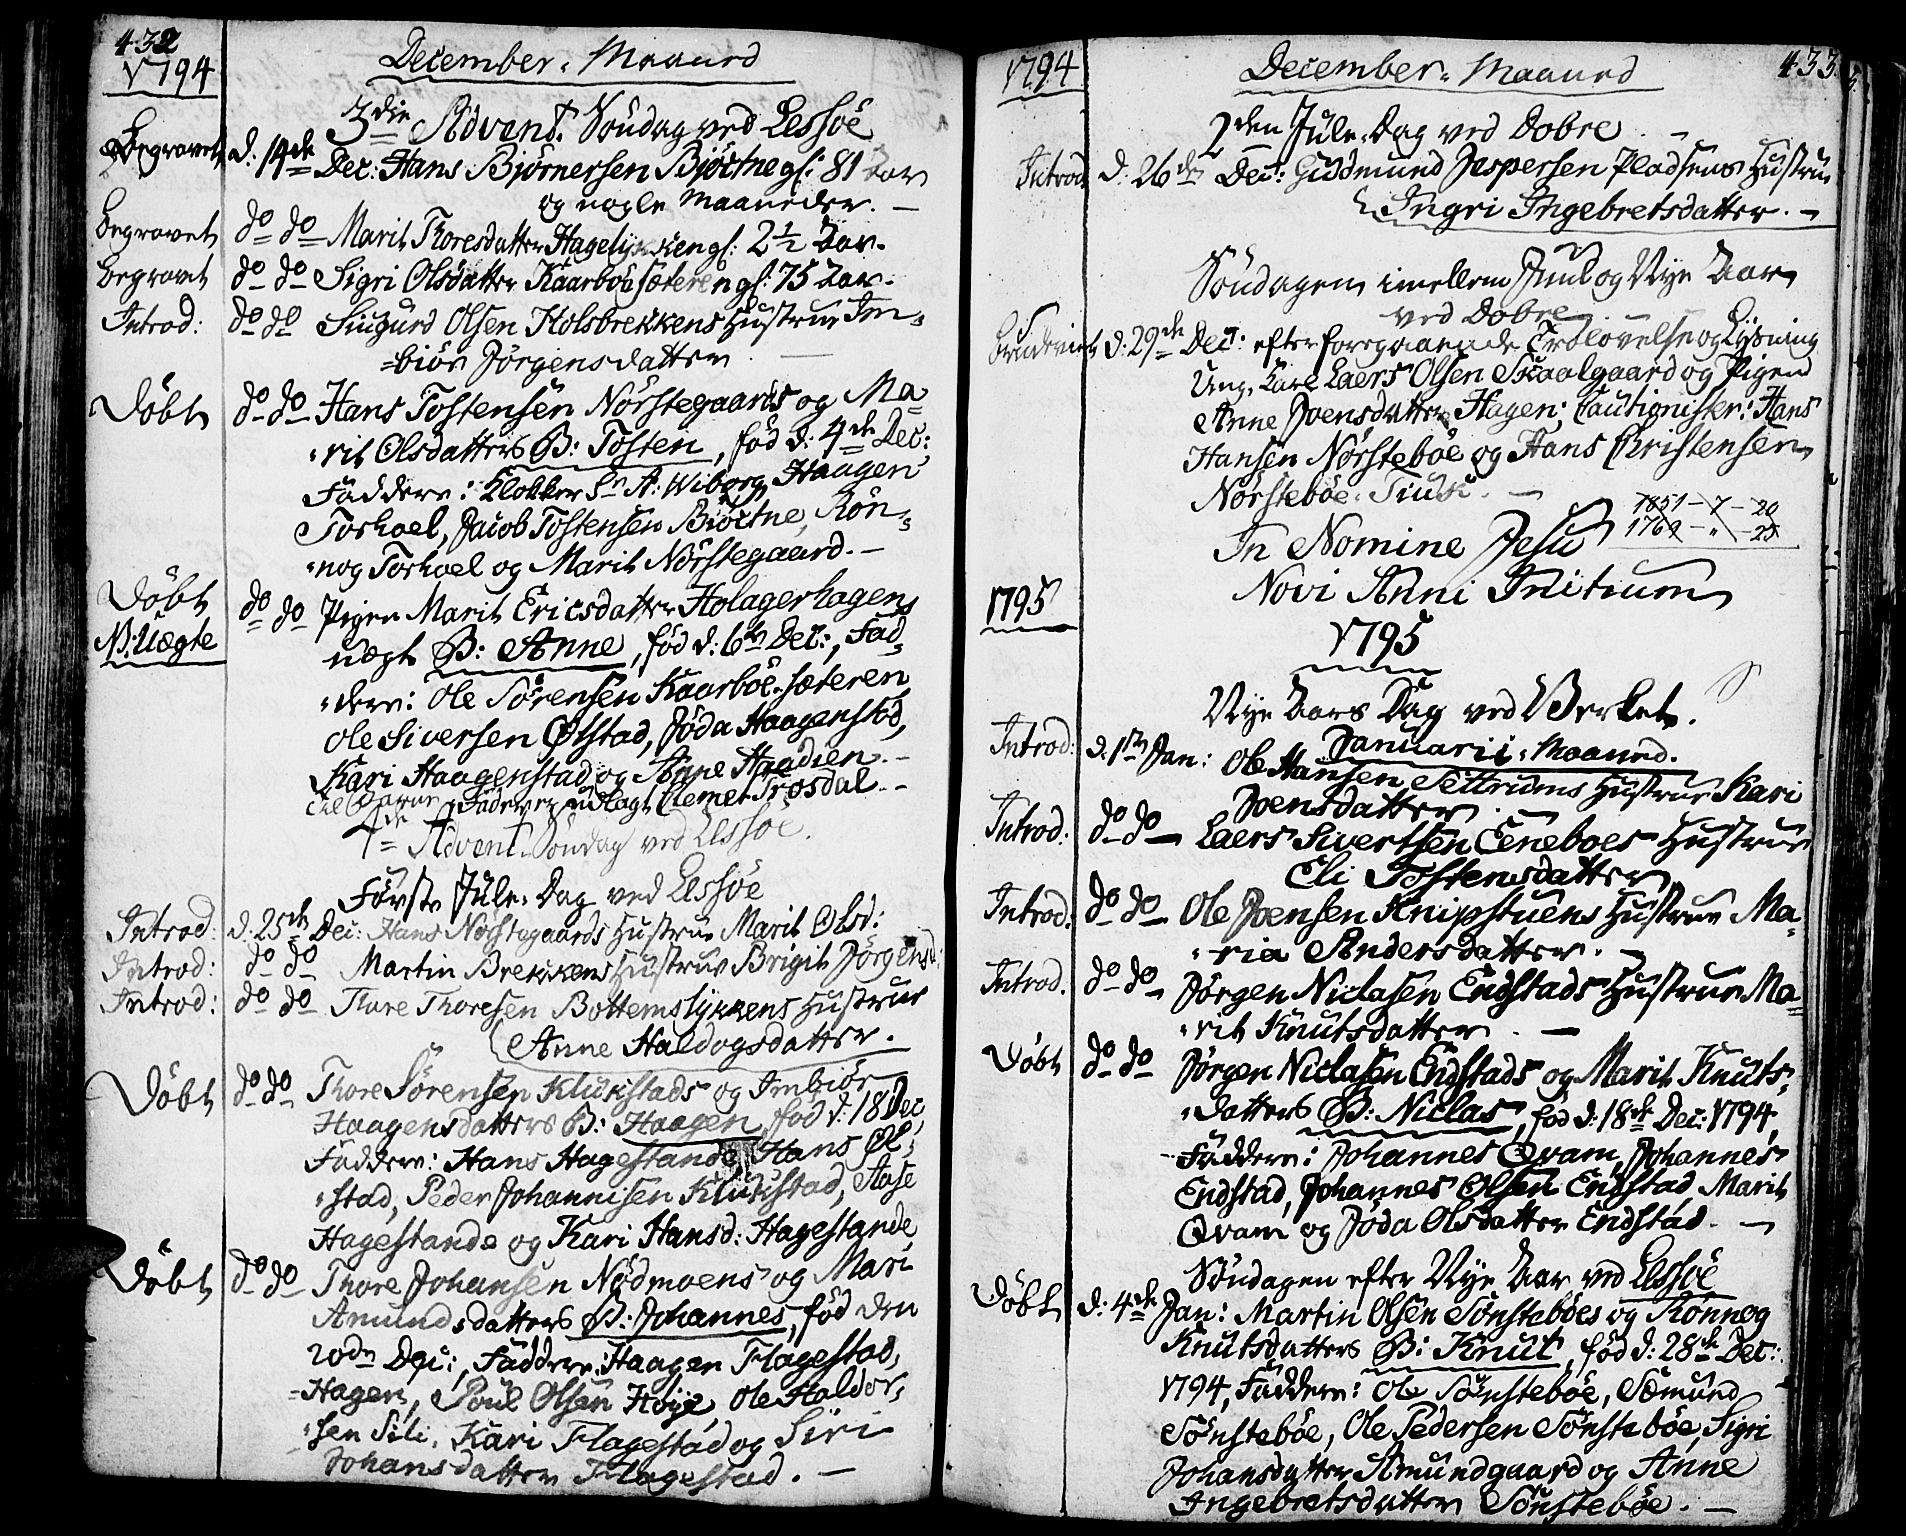 SAH, Lesja prestekontor, Ministerialbok nr. 3, 1777-1819, s. 432-433